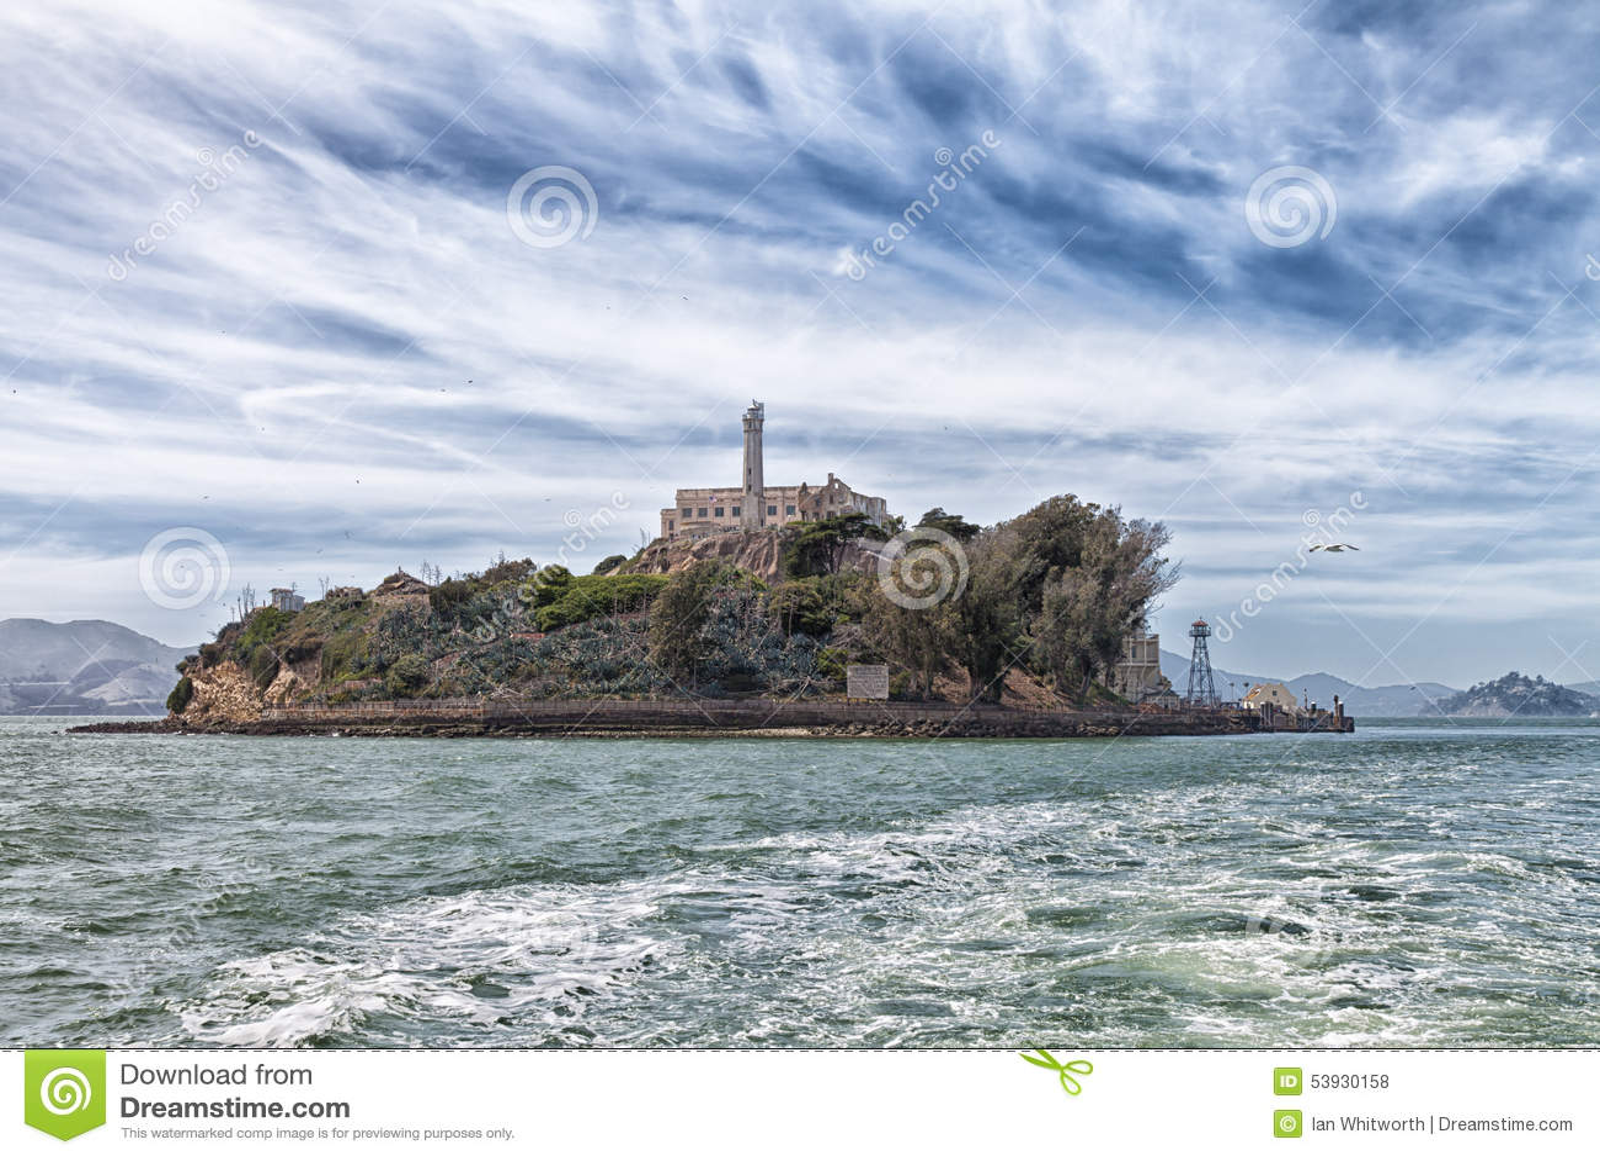 Alcatraz-Insel vom Wasser